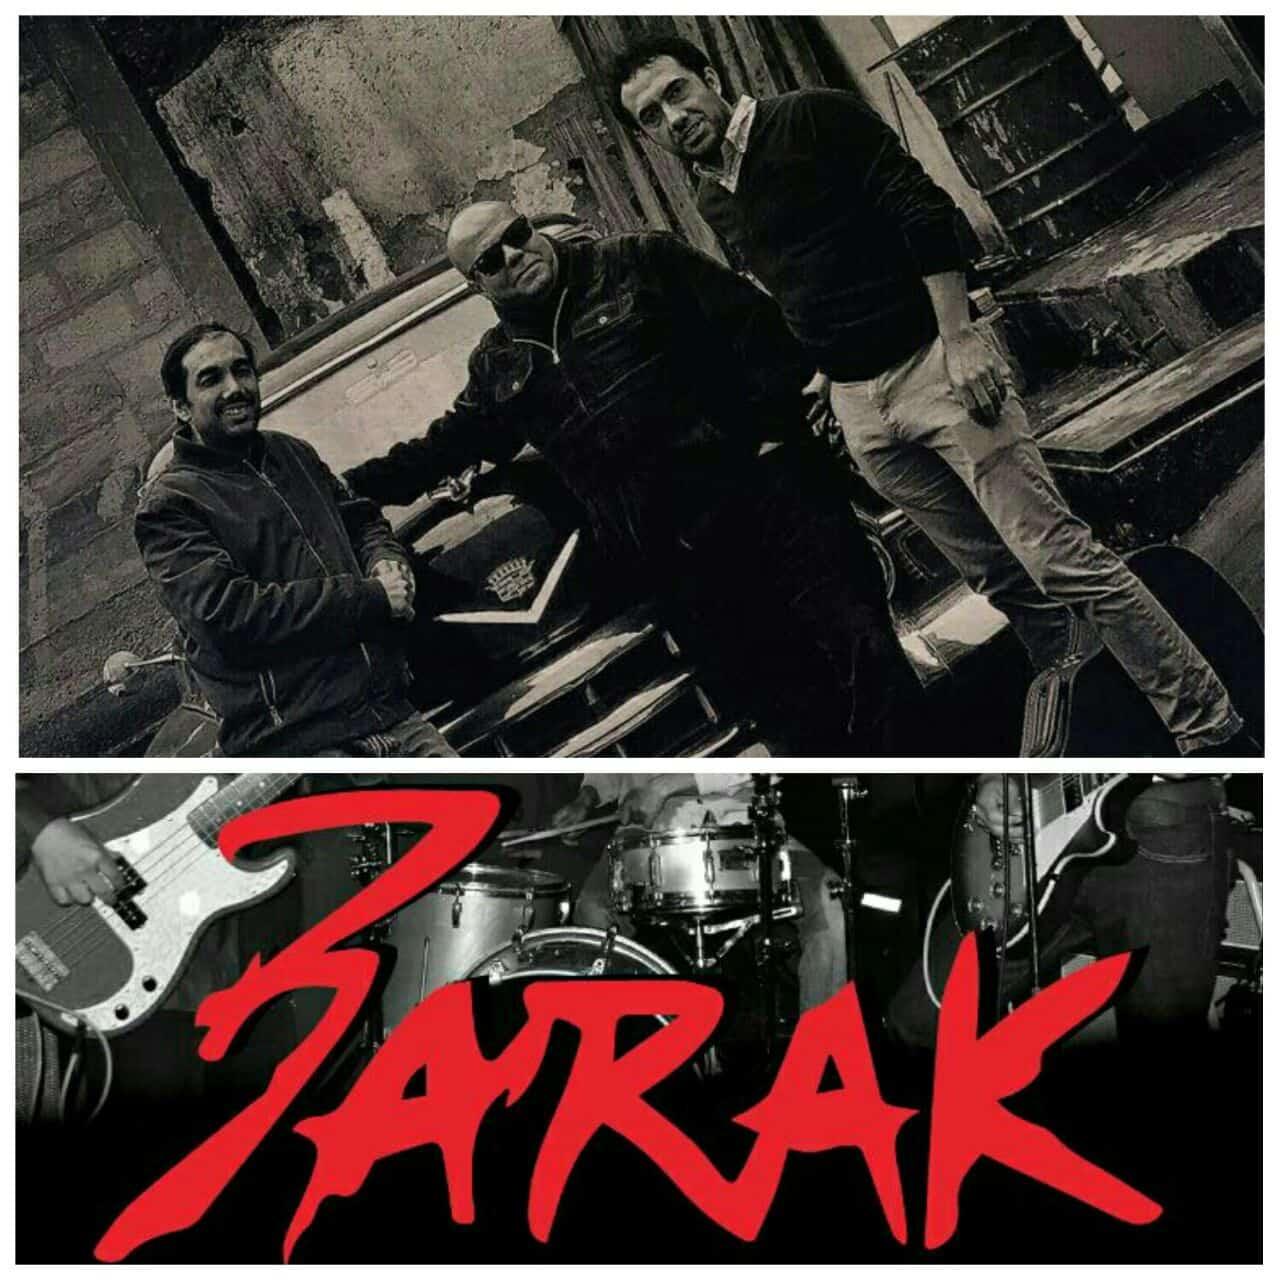 Arañas de Marte: Entrevistamos  a  Francisco  Quiroz  de  la  banda  ecuatoriana  Barak